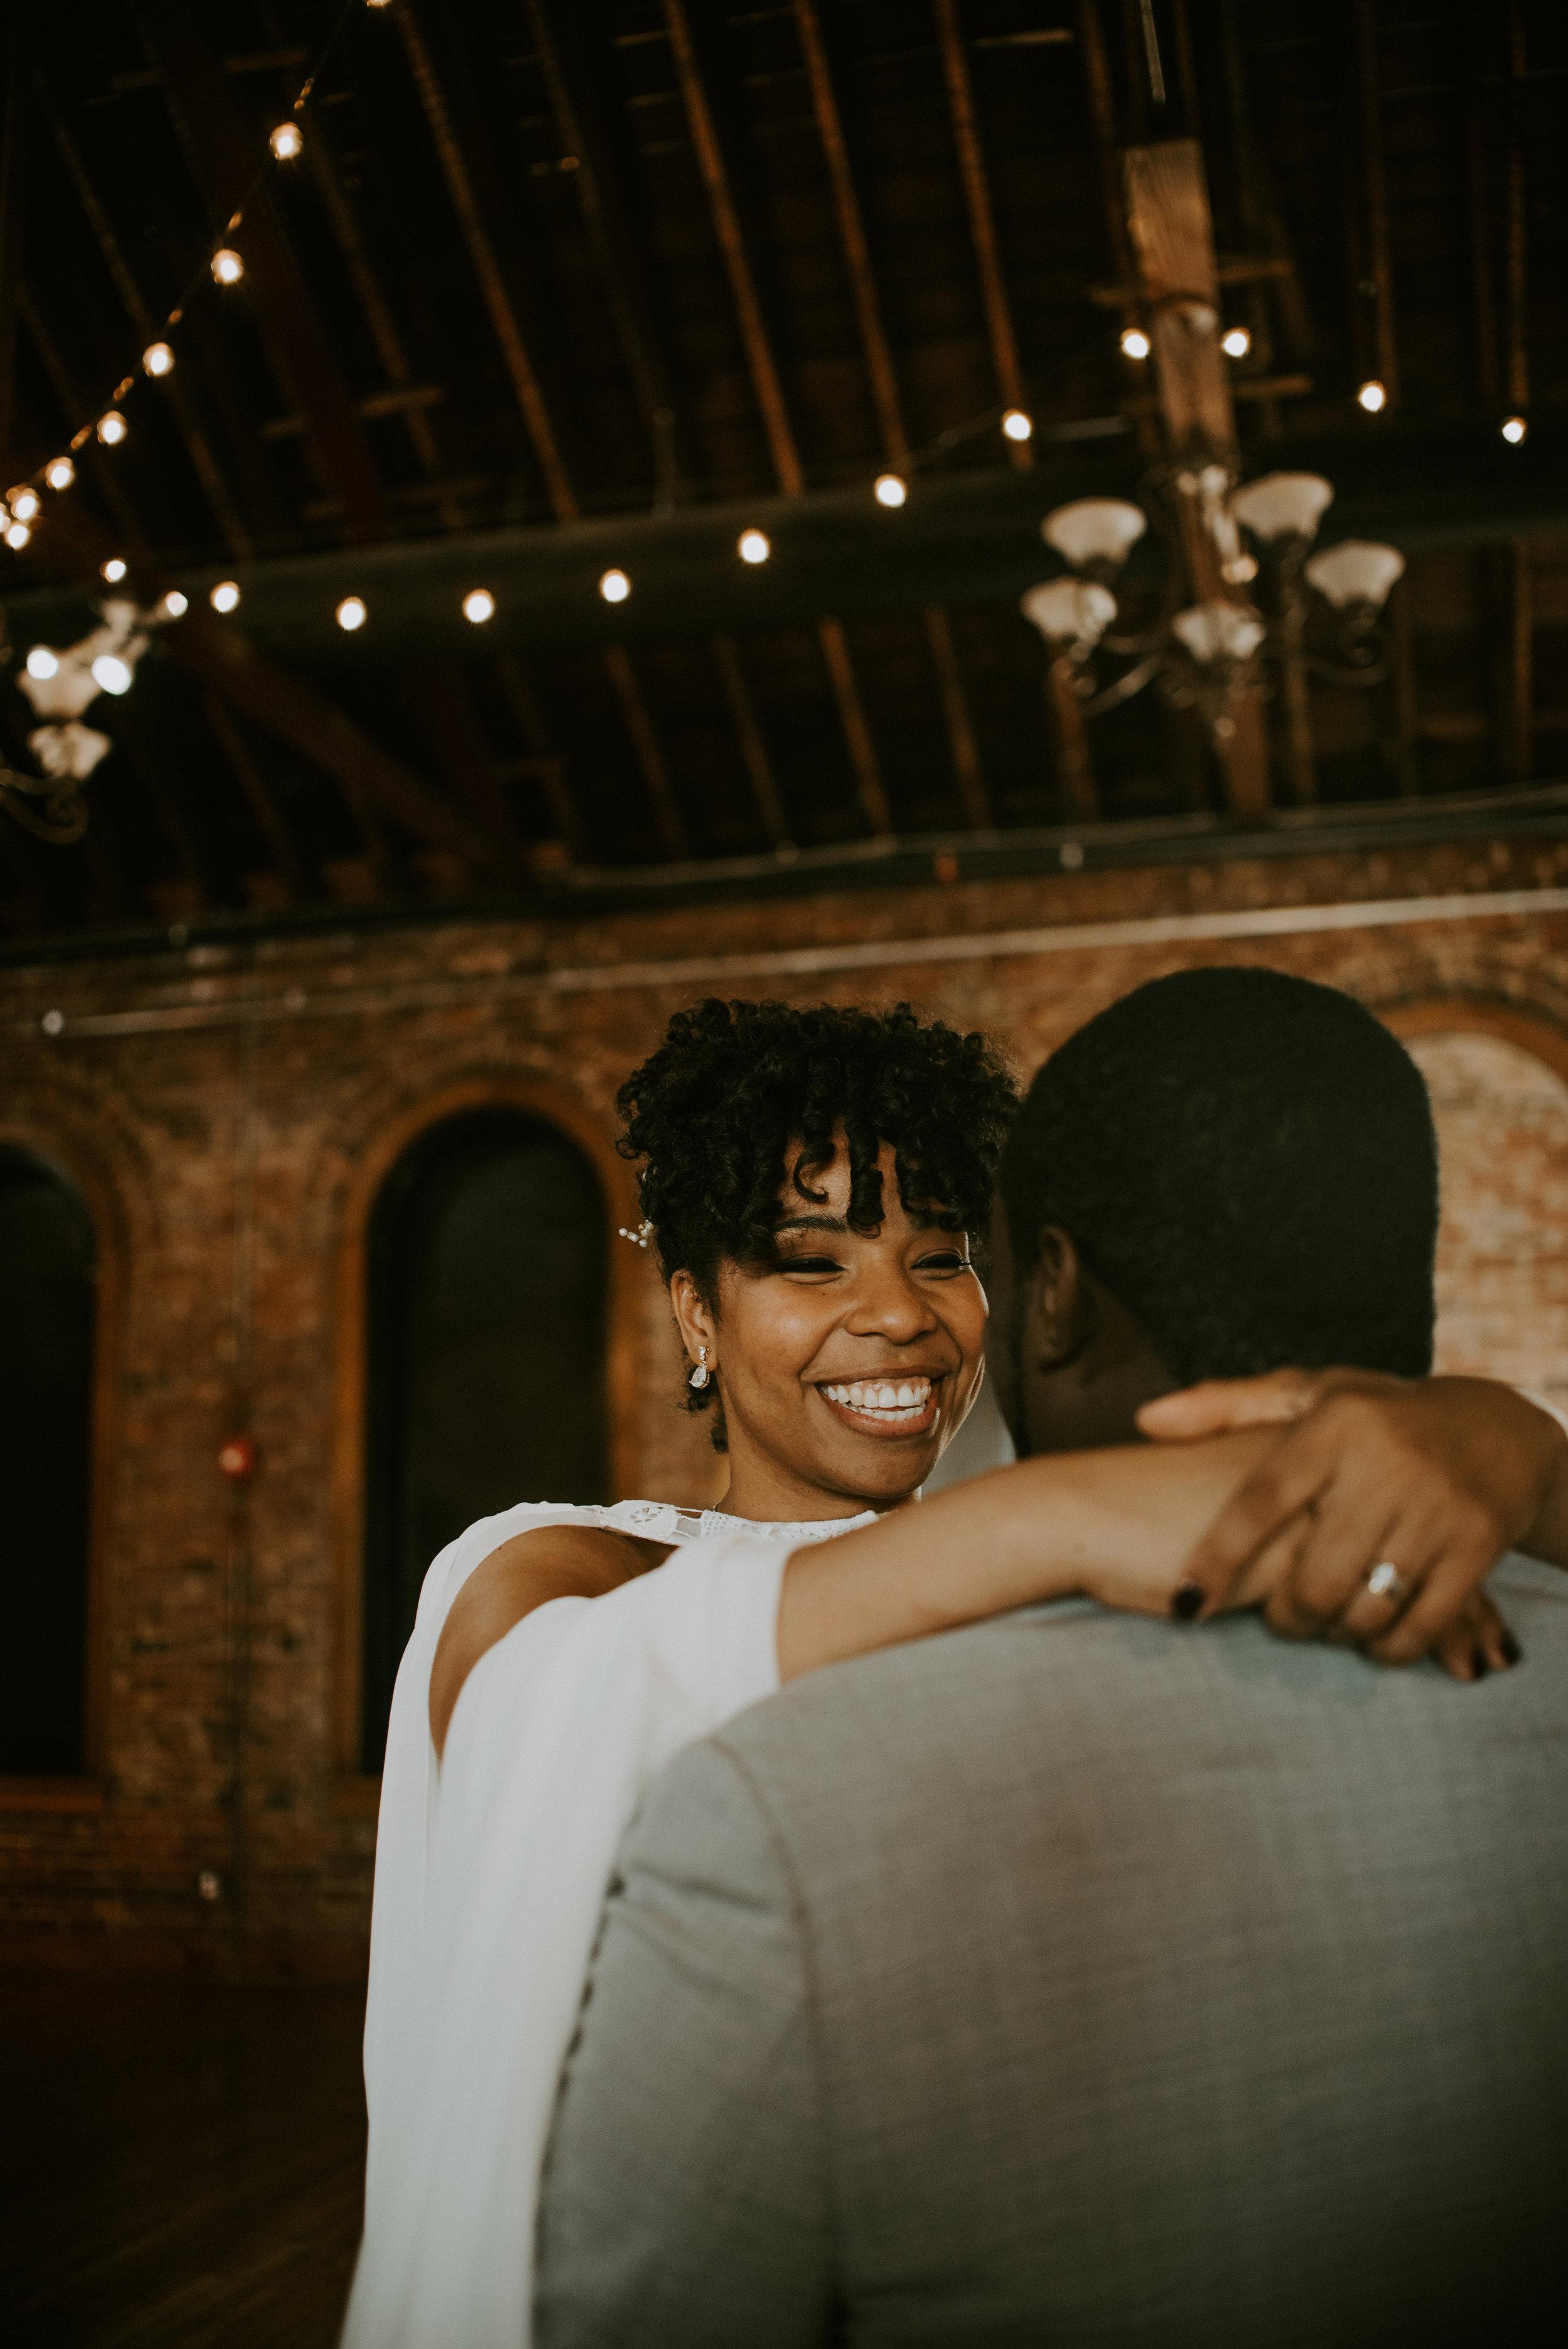 WonderlyCreative_Wedding_6.7.18_Khara&Dwayne_-835.jpg